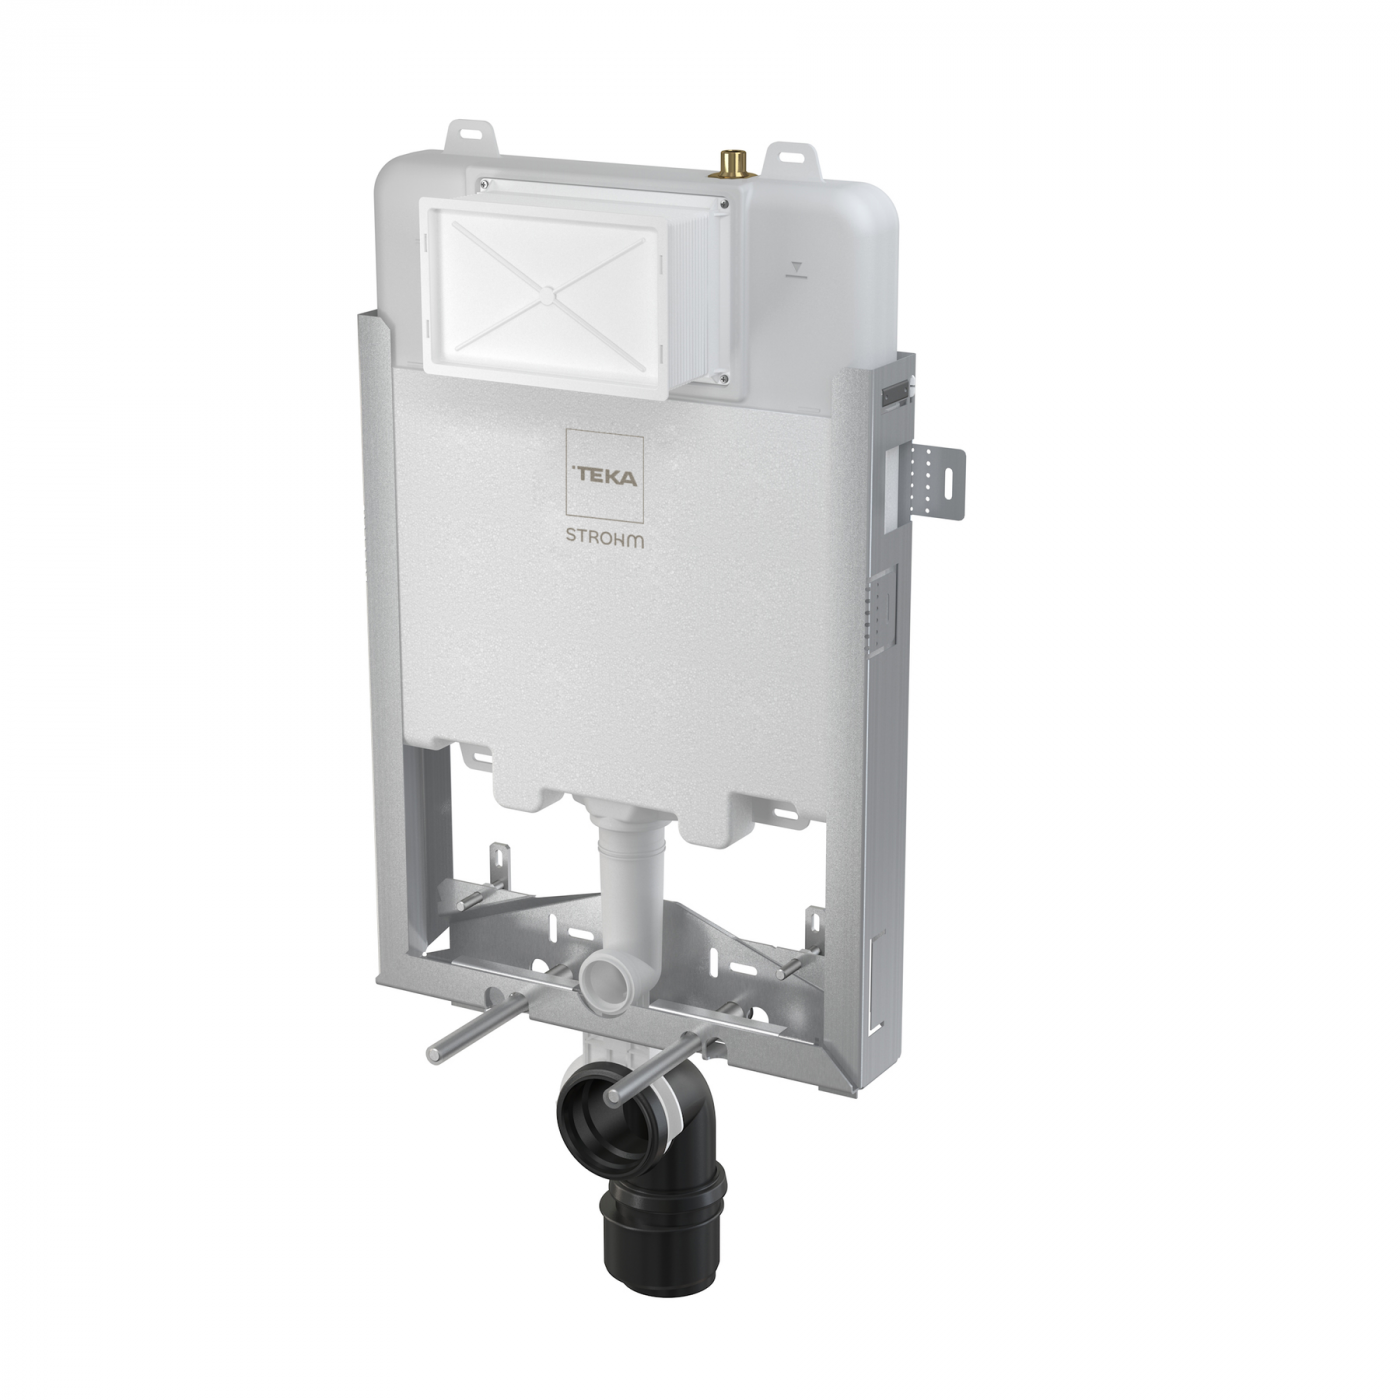 Cisterna empotrada tekmodul slim 1